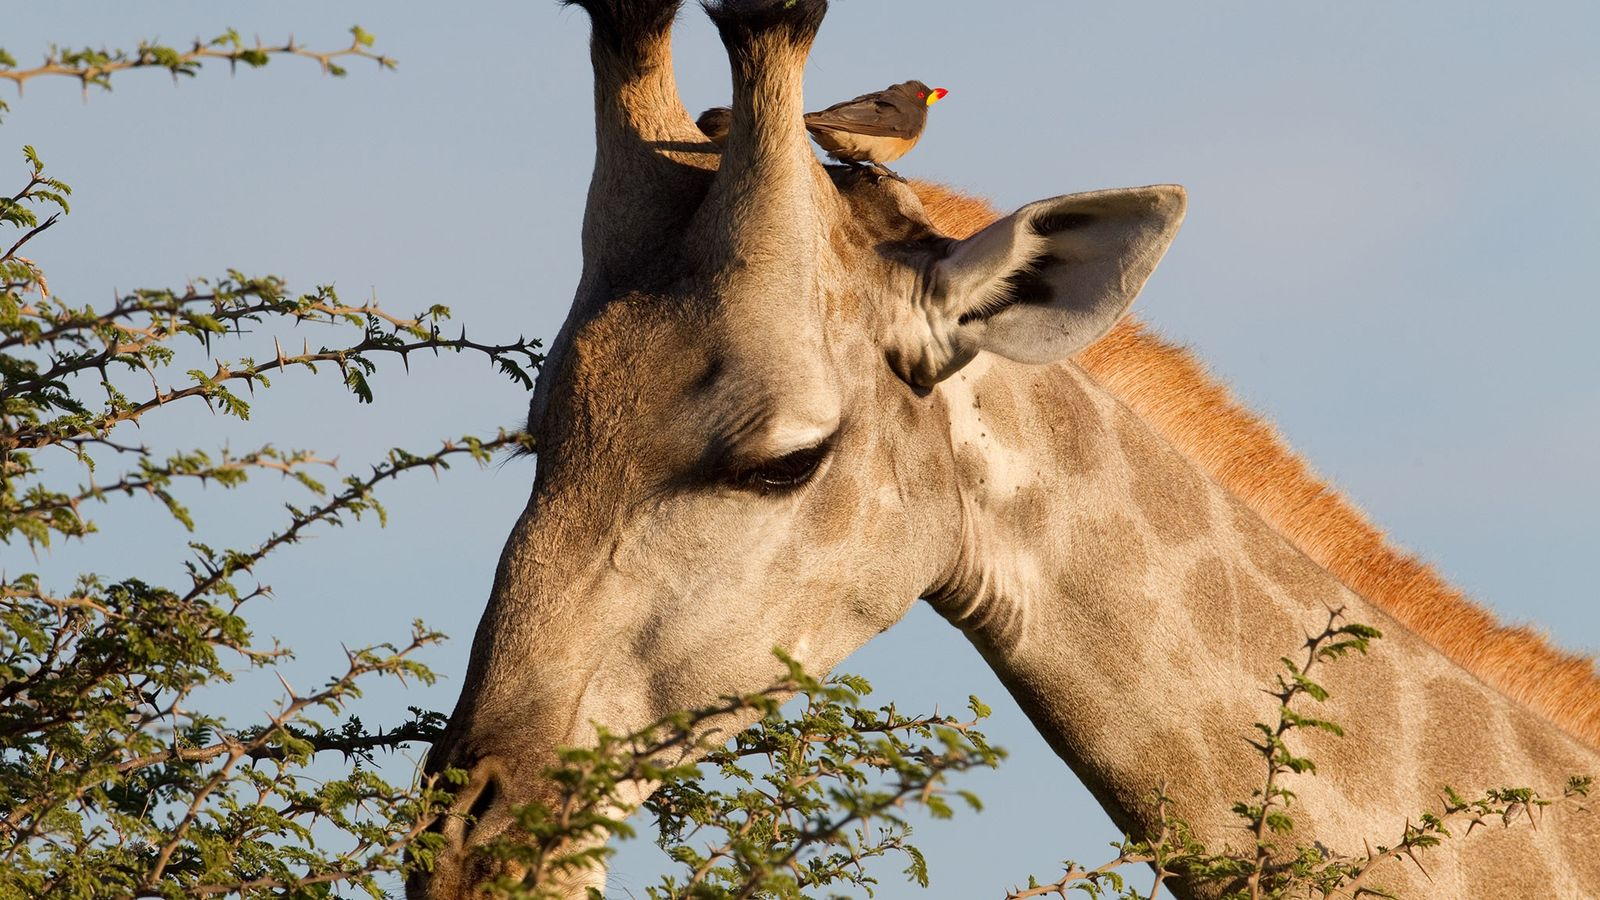 A yellow-billed oxpecker perches on the head of a giraffe in Botswana's Okavango Delta.